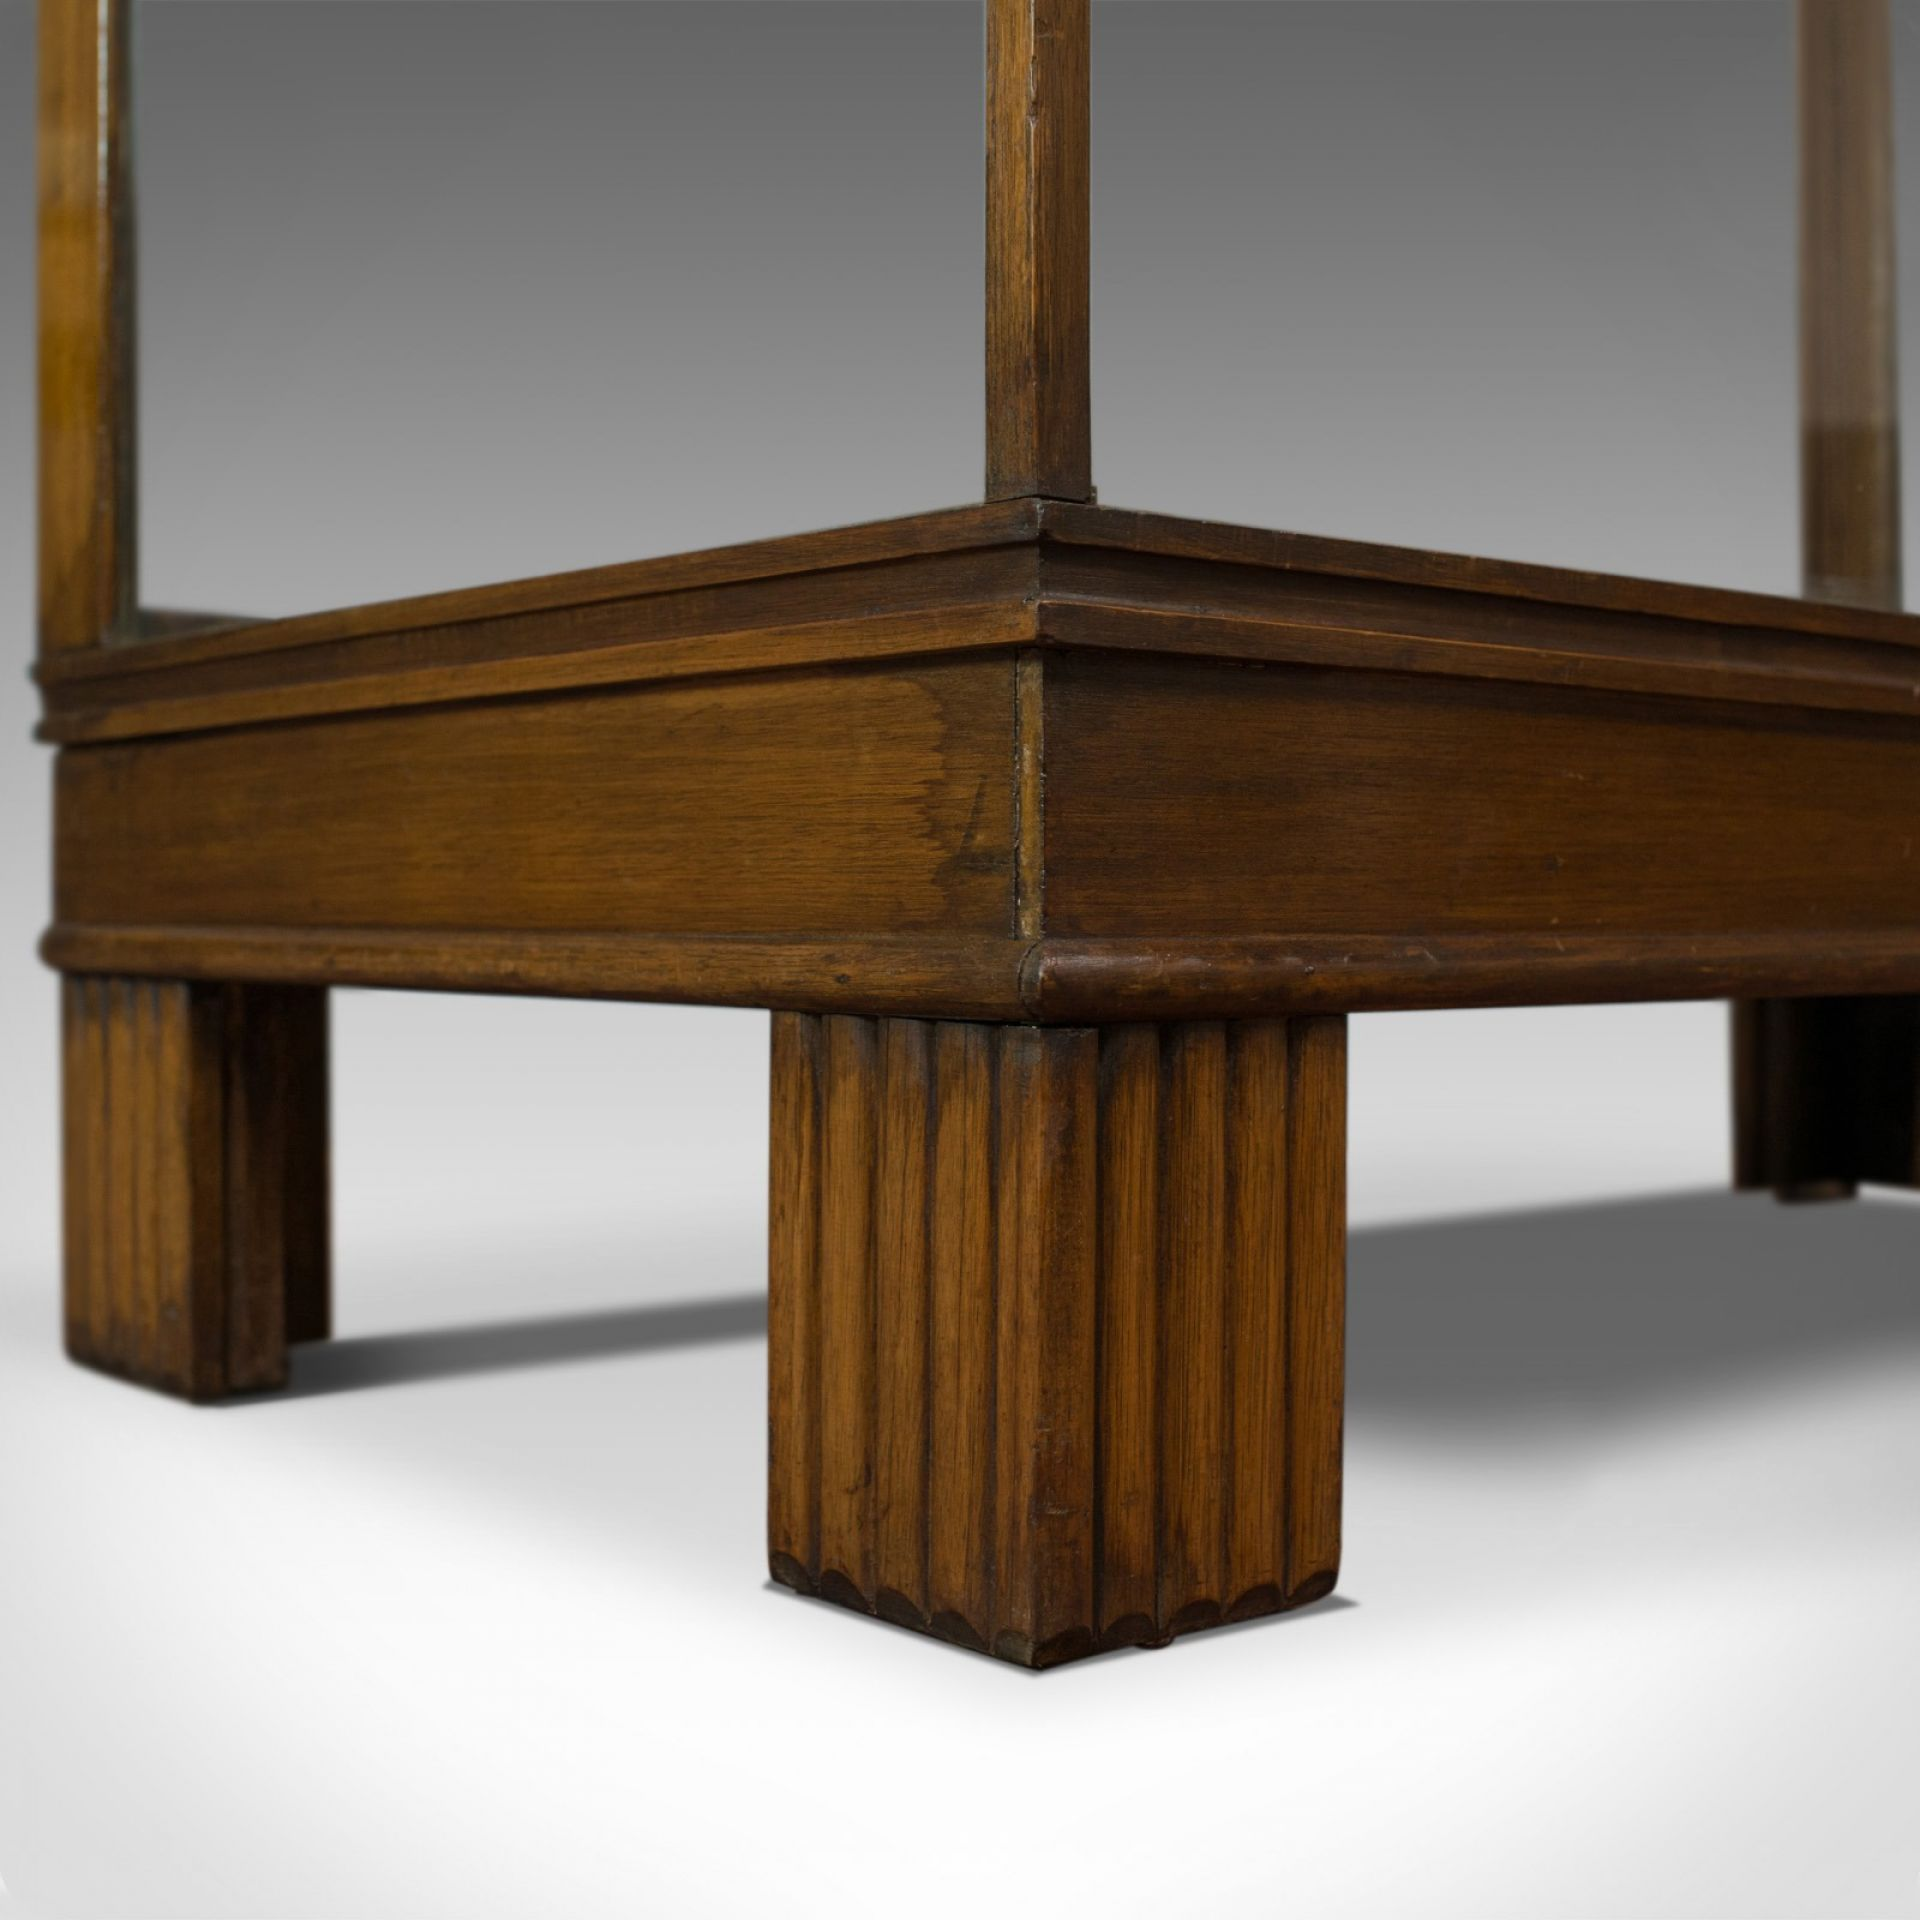 Antique Shop Display Cabinet, English, Art Deco Oak Showcase, Shop Fitting c1930